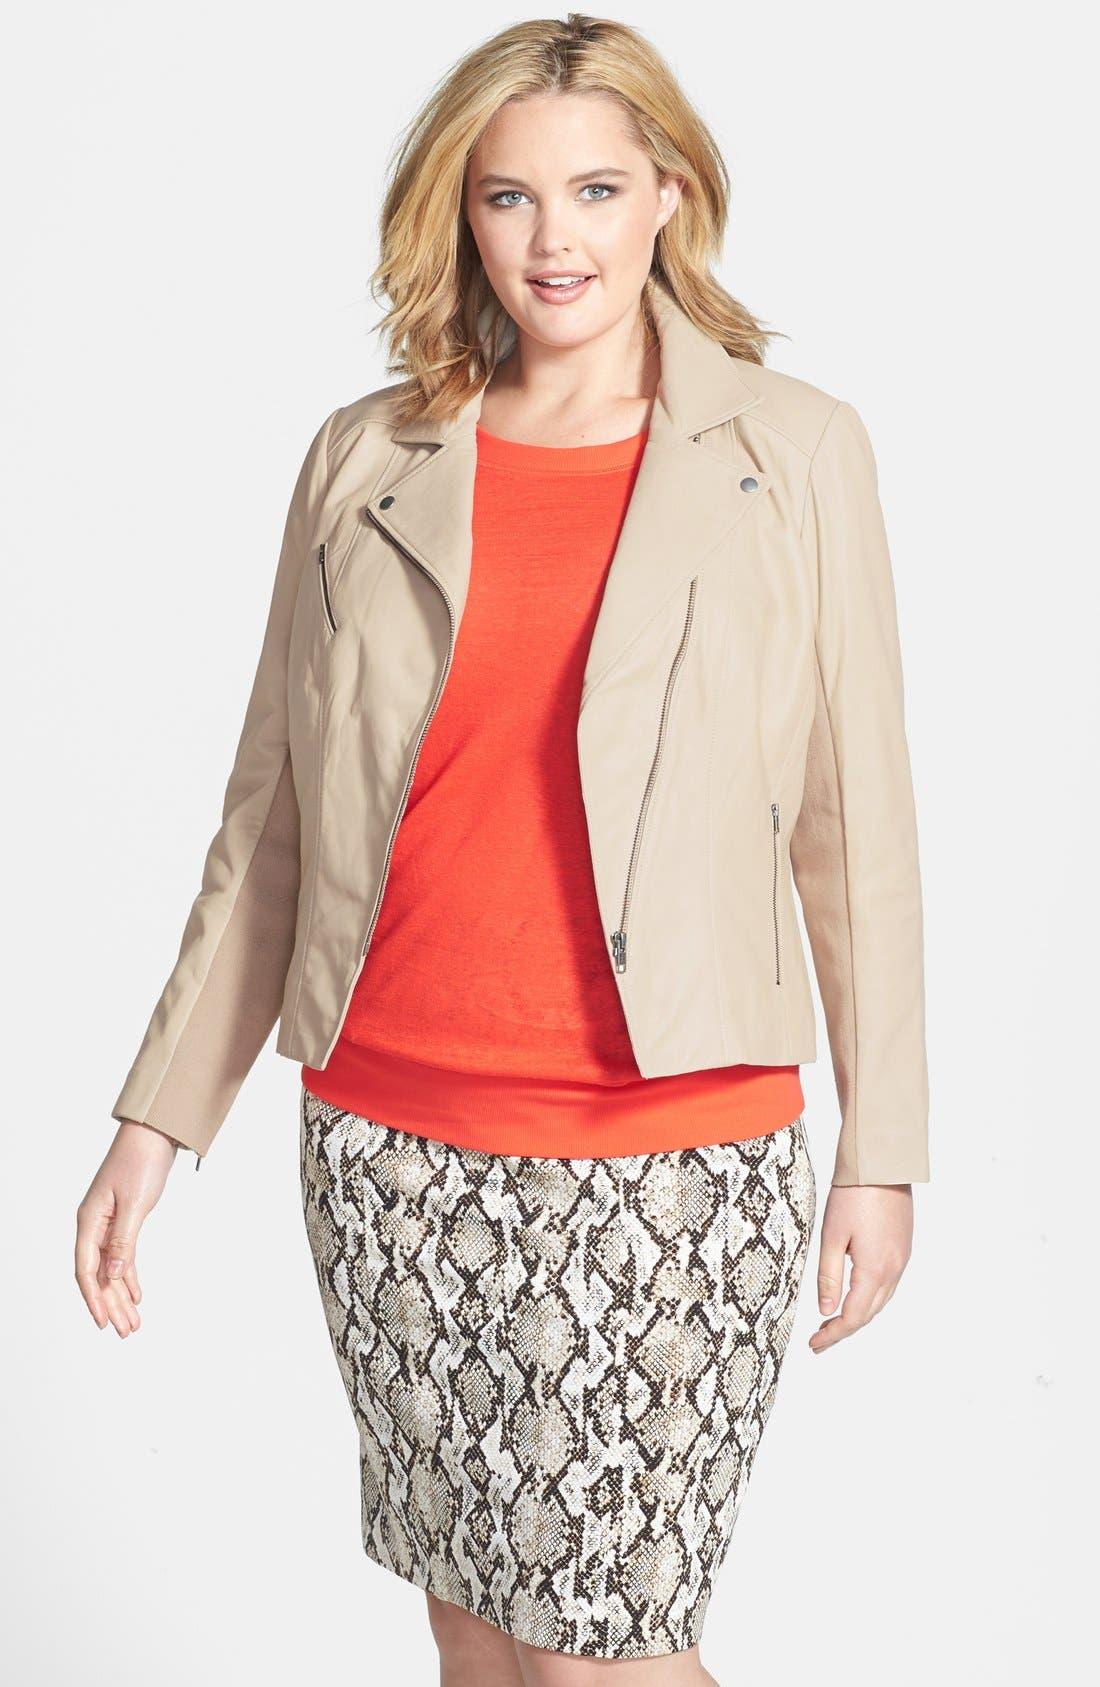 Alternate Image 1 Selected - Halogen® 'Powder' Lambskin Leather Jacket (Plus Size)